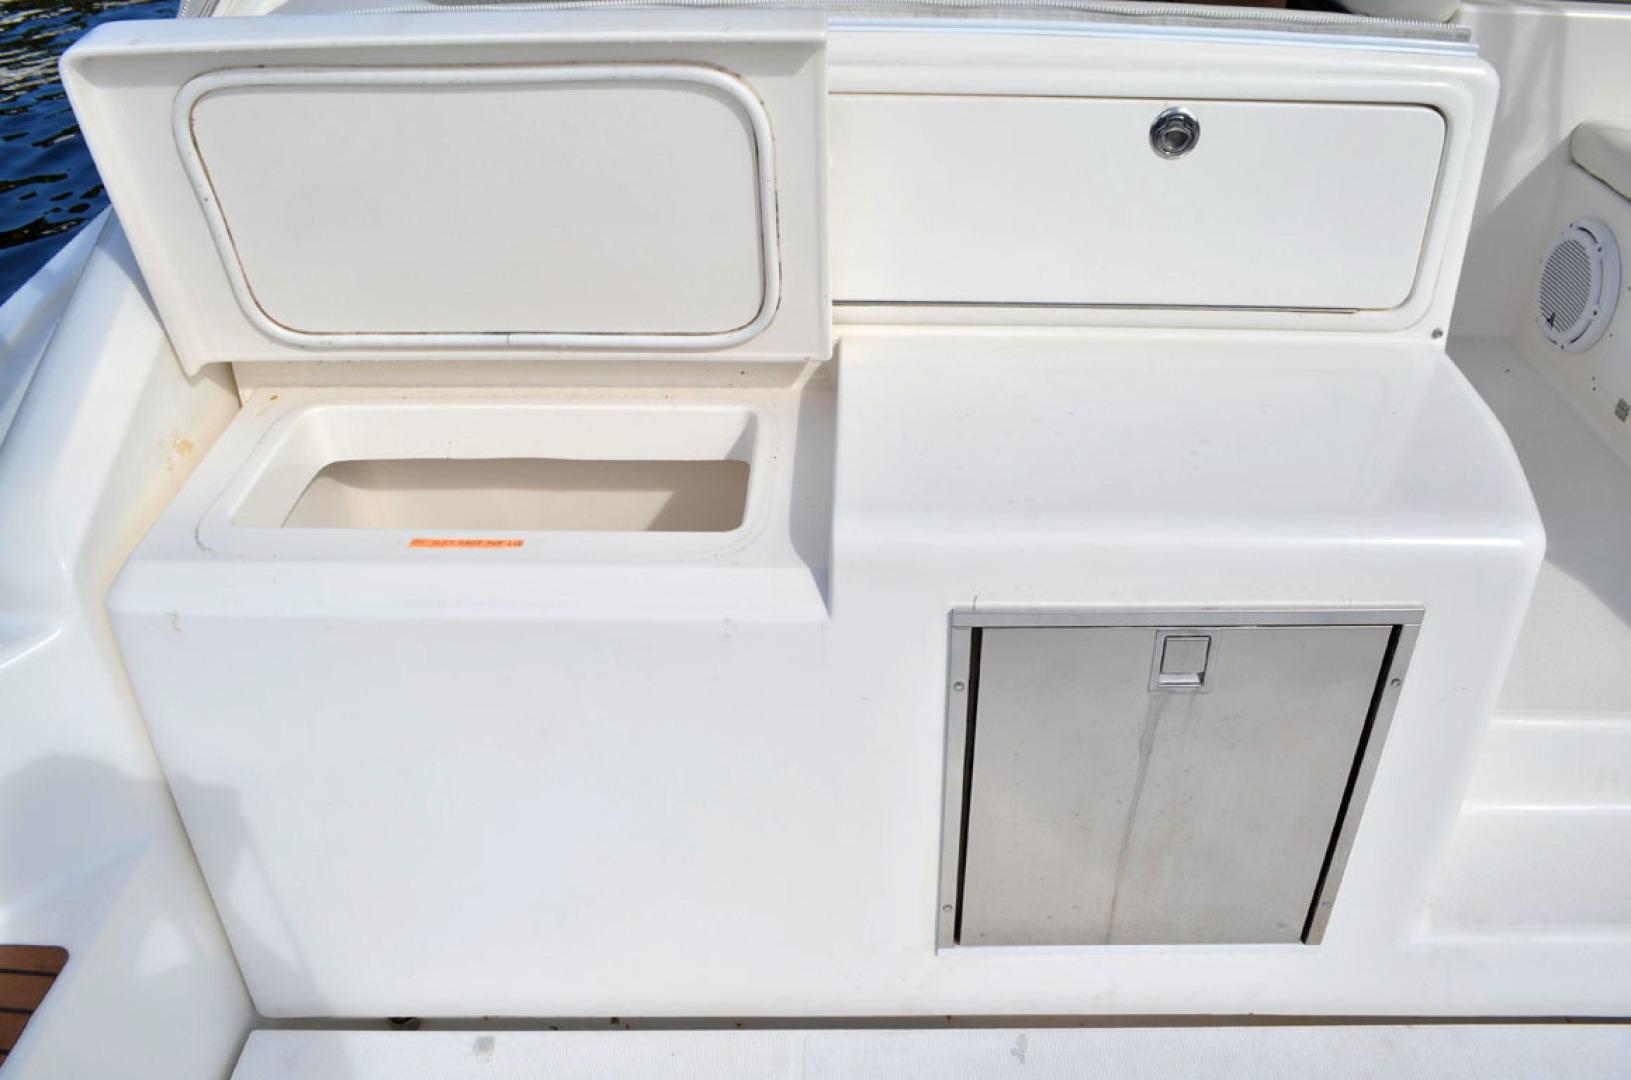 Riviera-4000 Express 2001-Shady Lady Hampton Bays-New York-United States-Tackle Center And Fridge-1547570 | Thumbnail